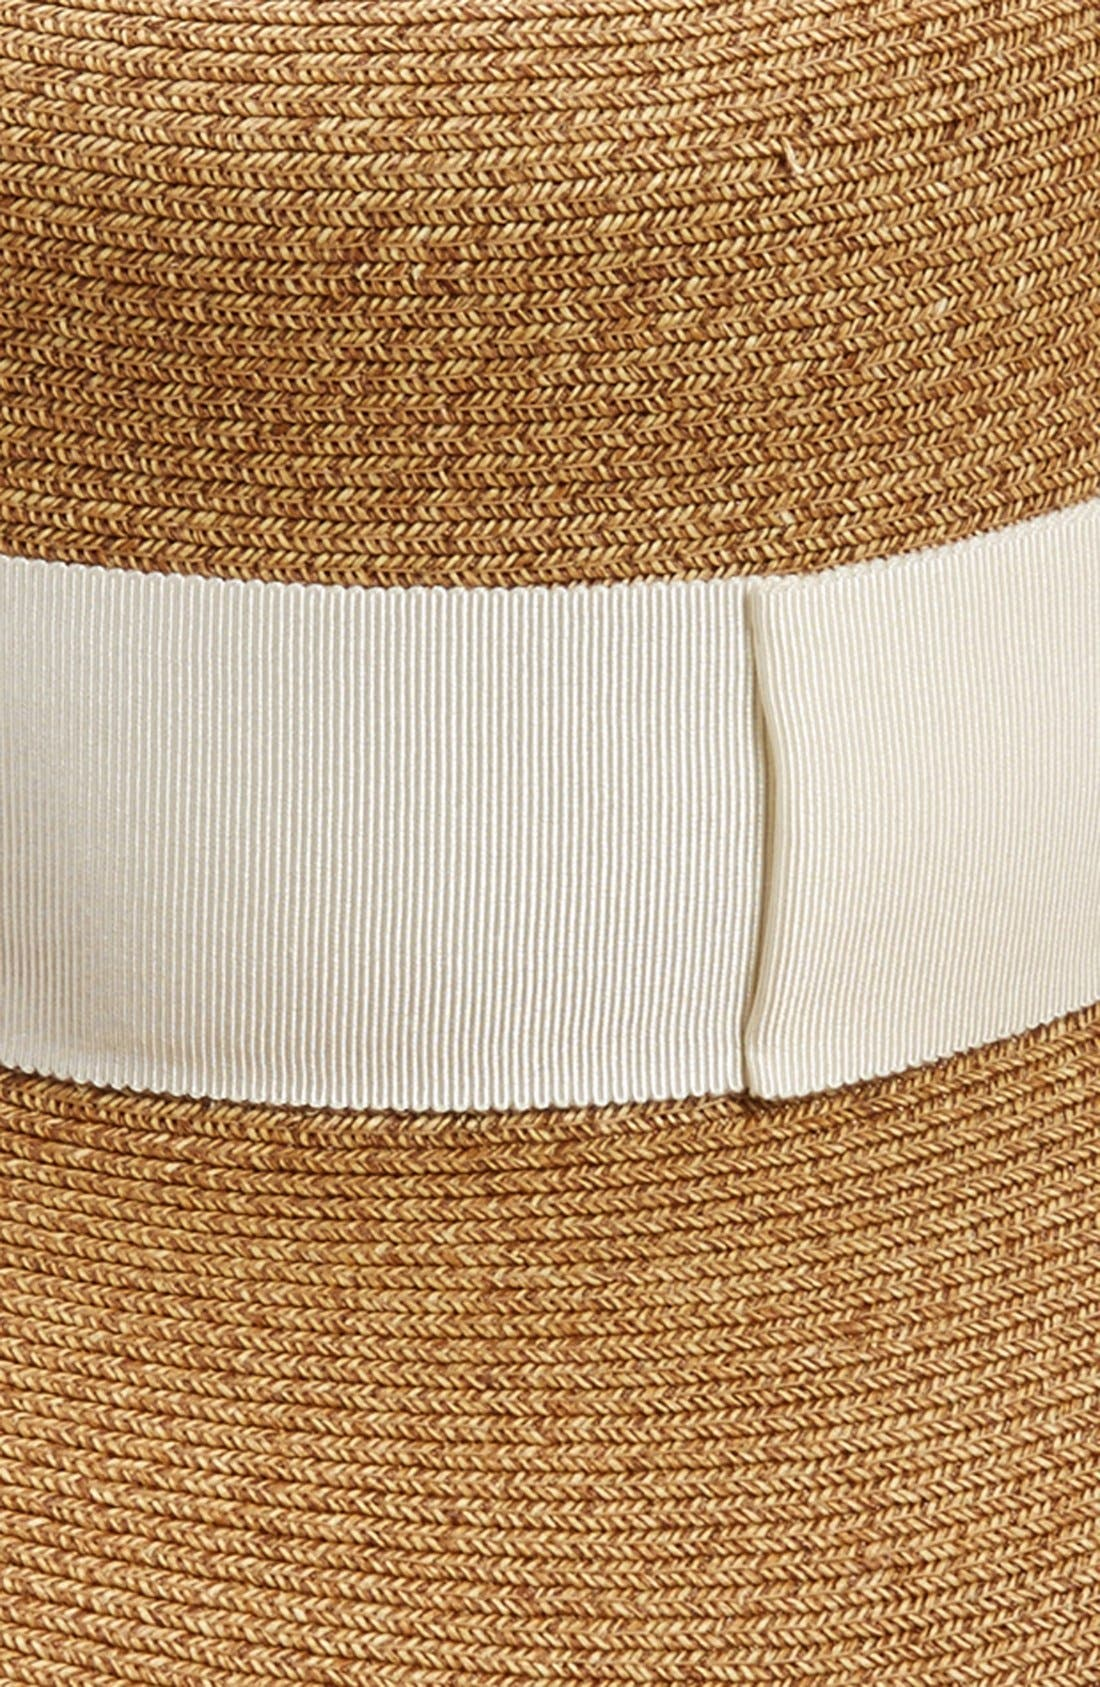 Alternate Image 2  - Eugenina Kim Straw Sun Hat